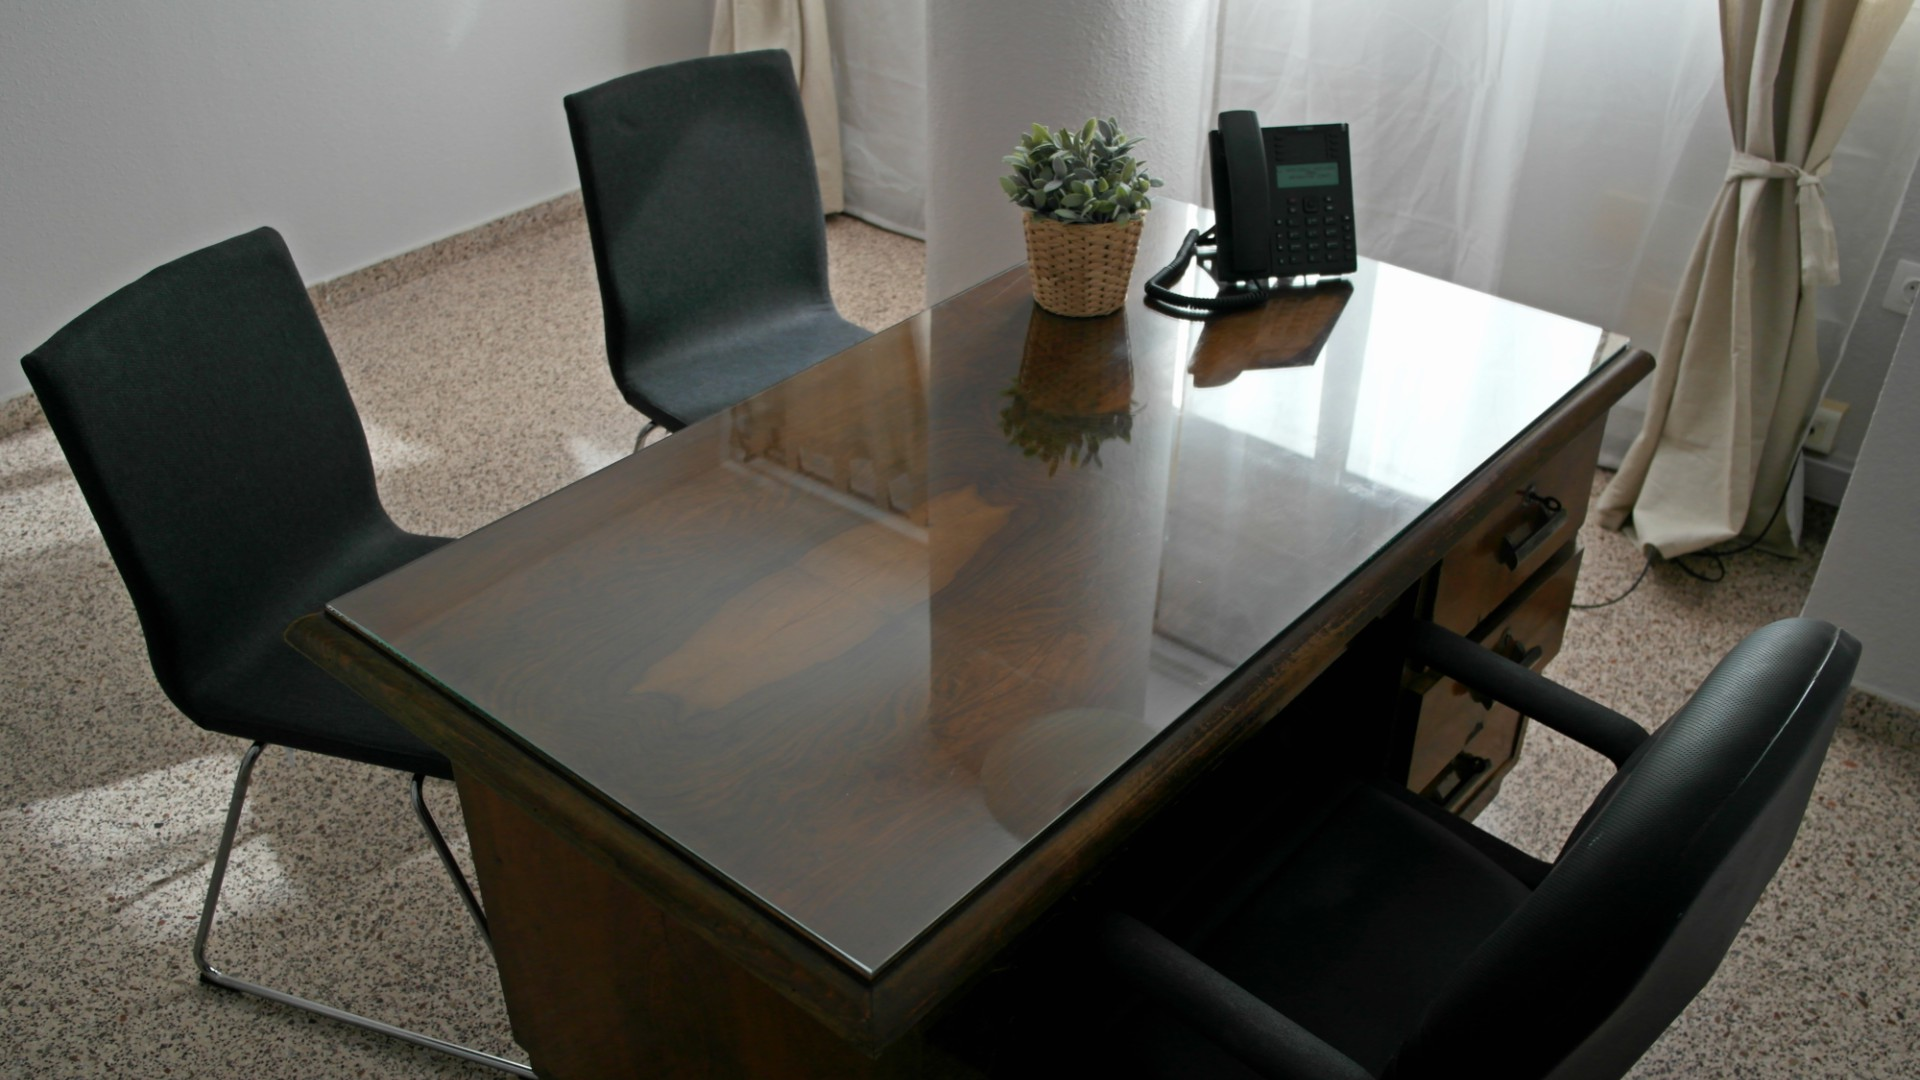 mv33 coworking - despacho privado